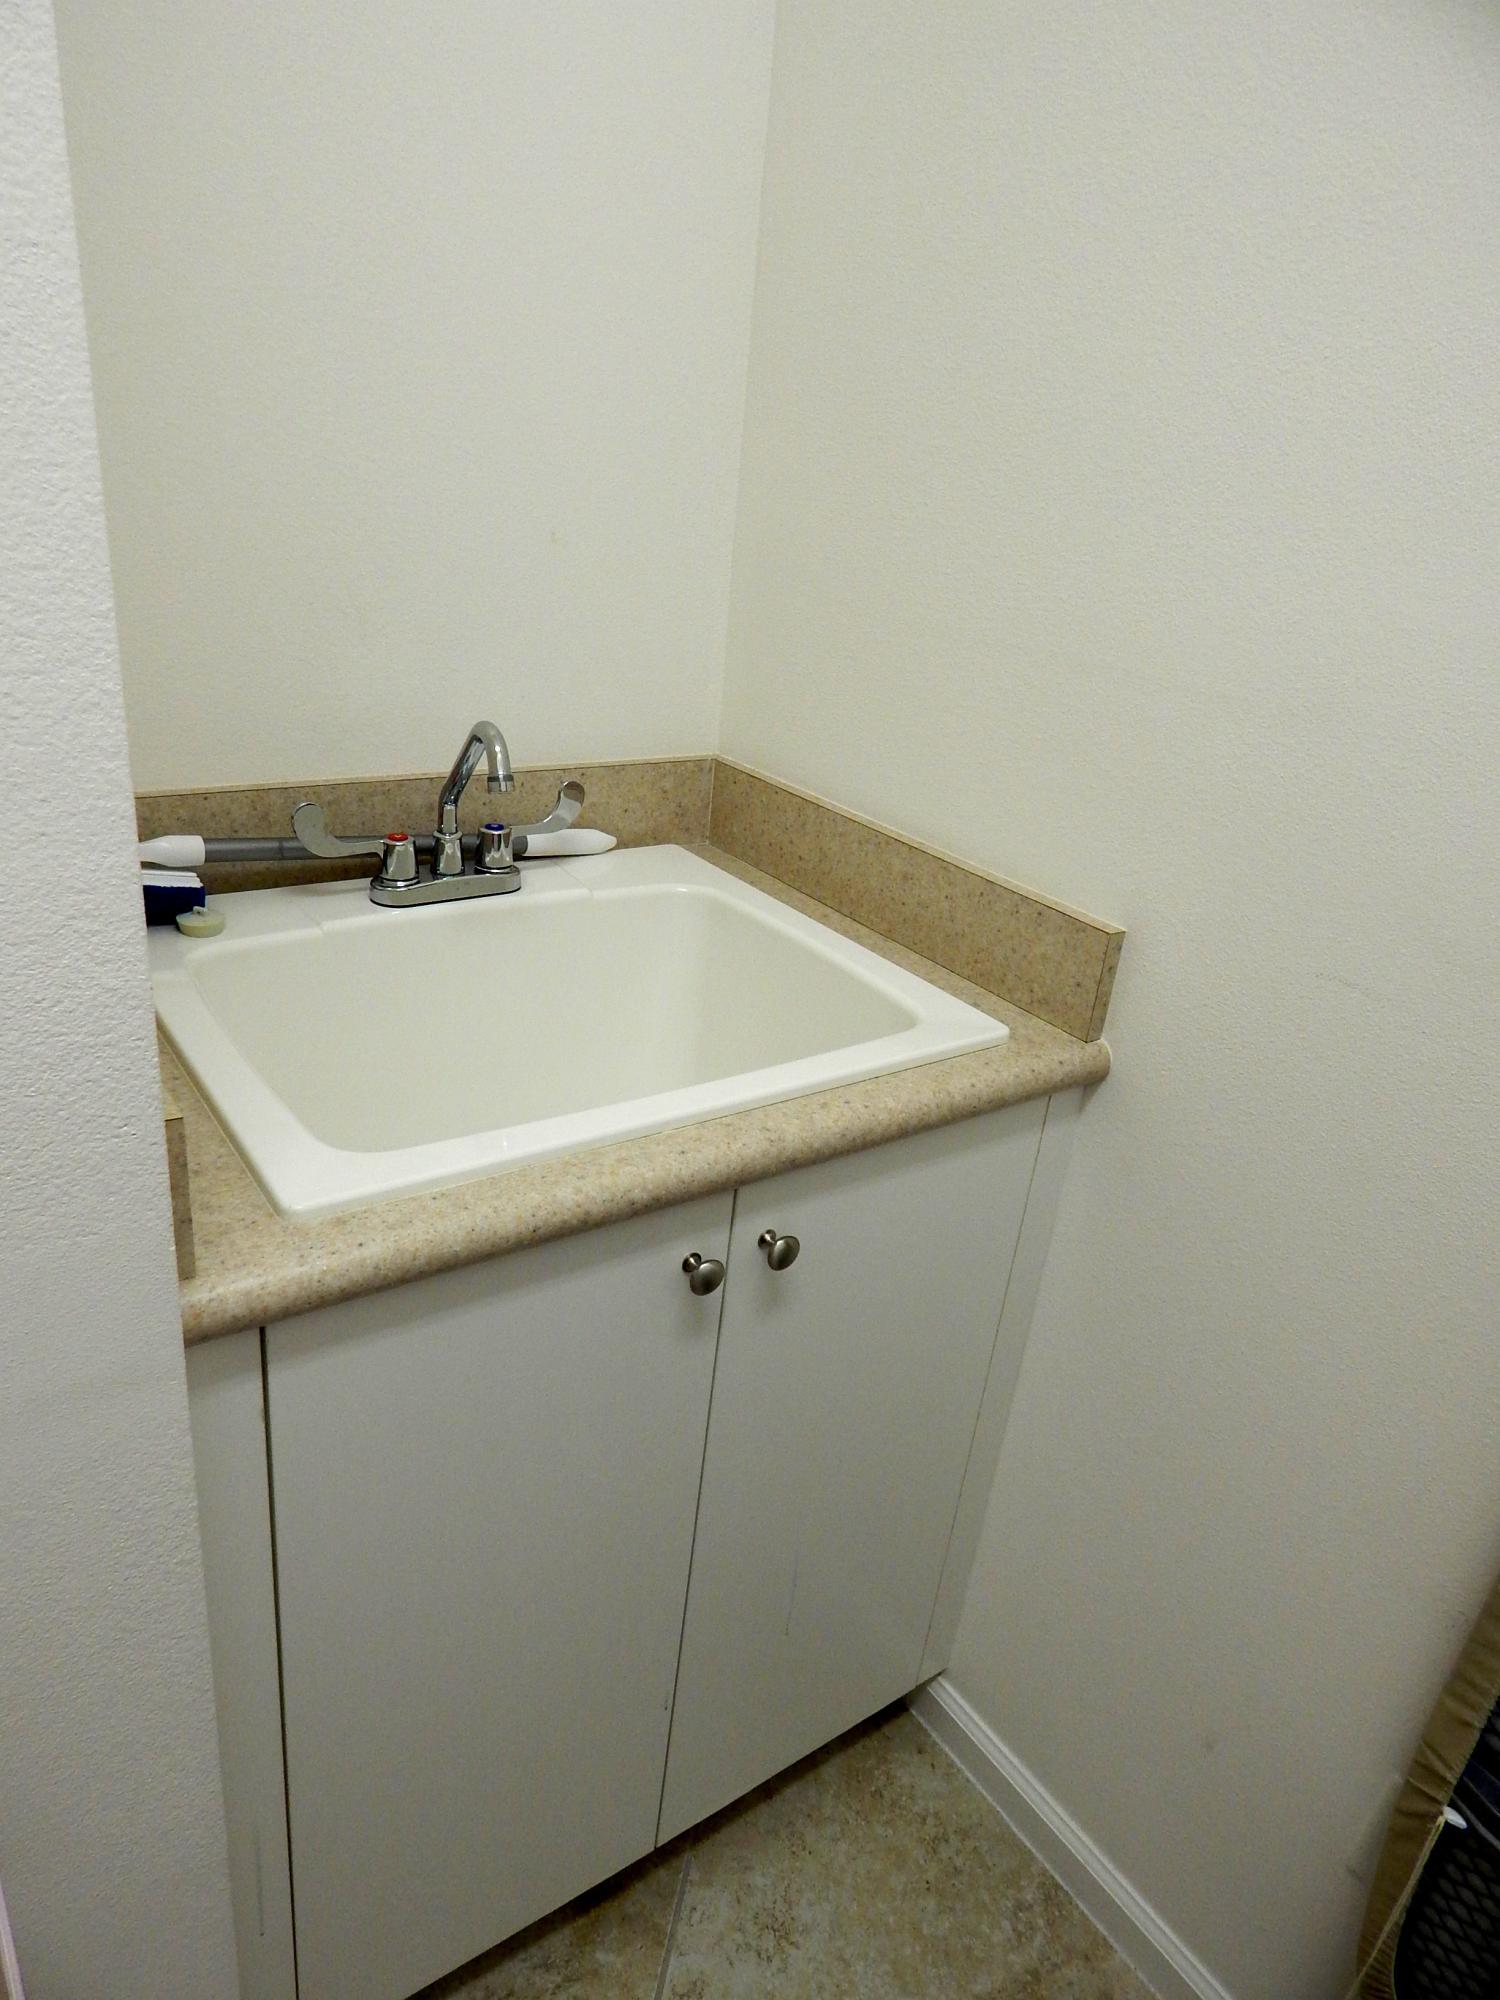 024 Laundry sink